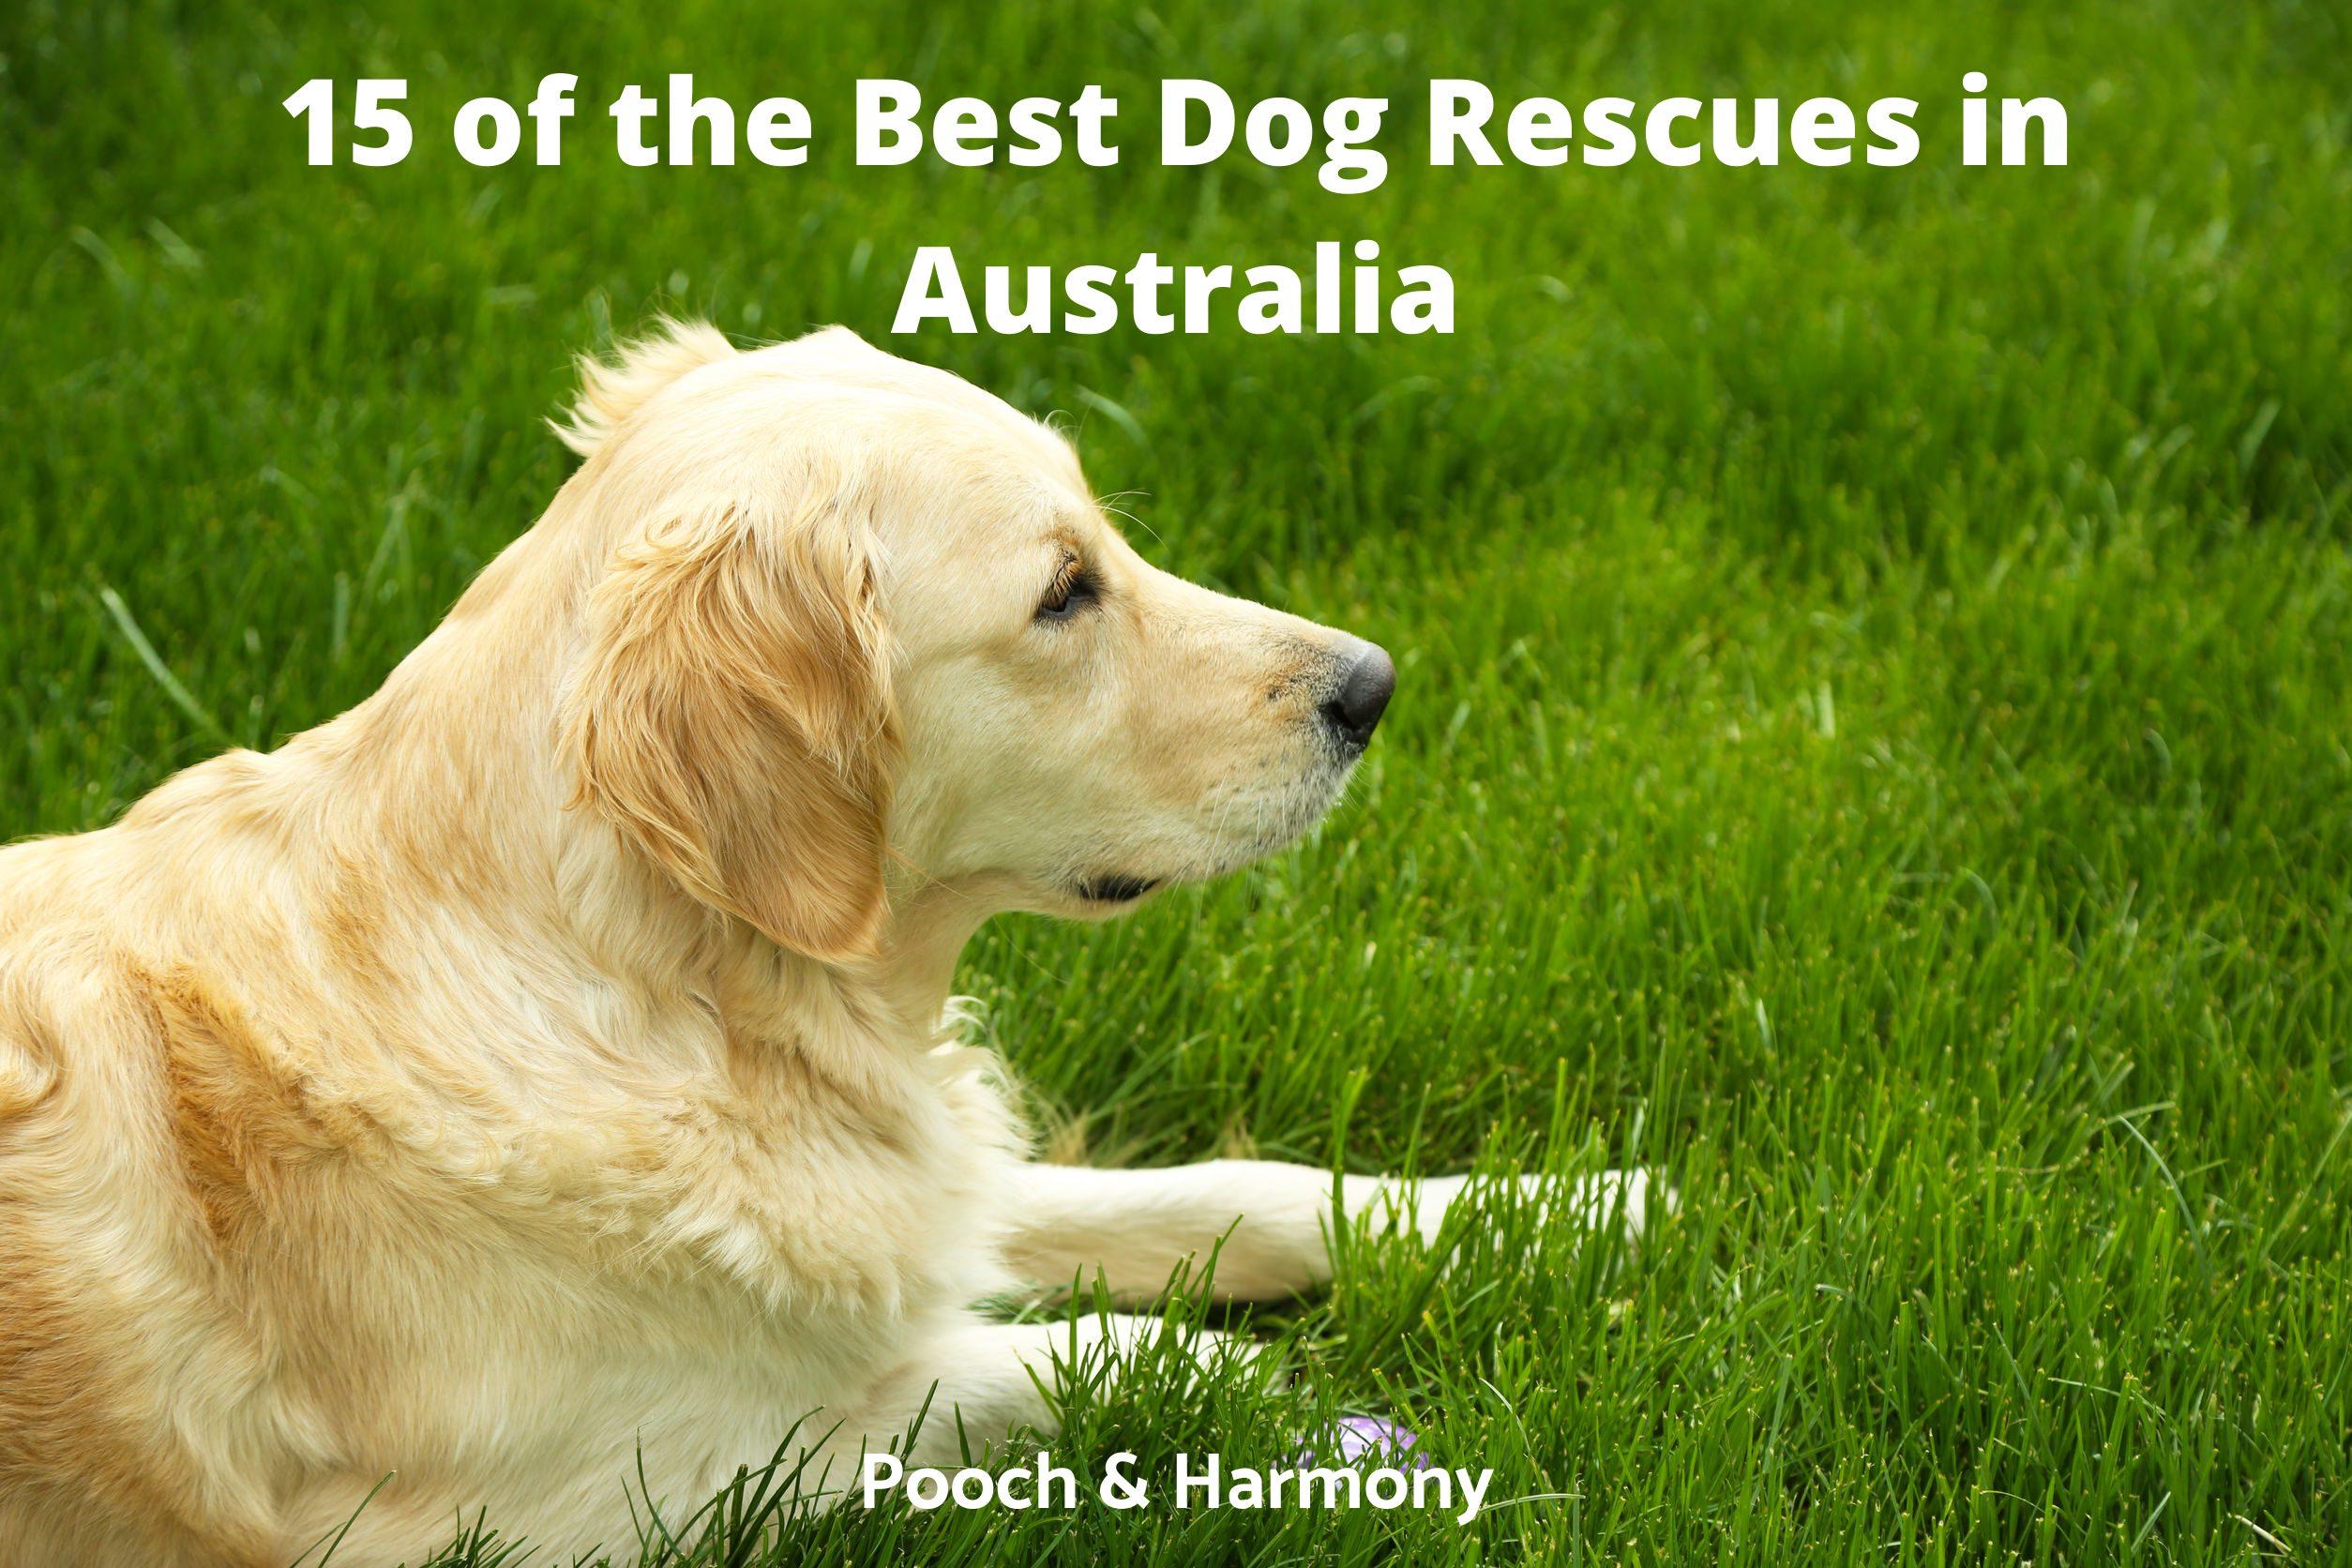 Best Dog Rescues in Australia